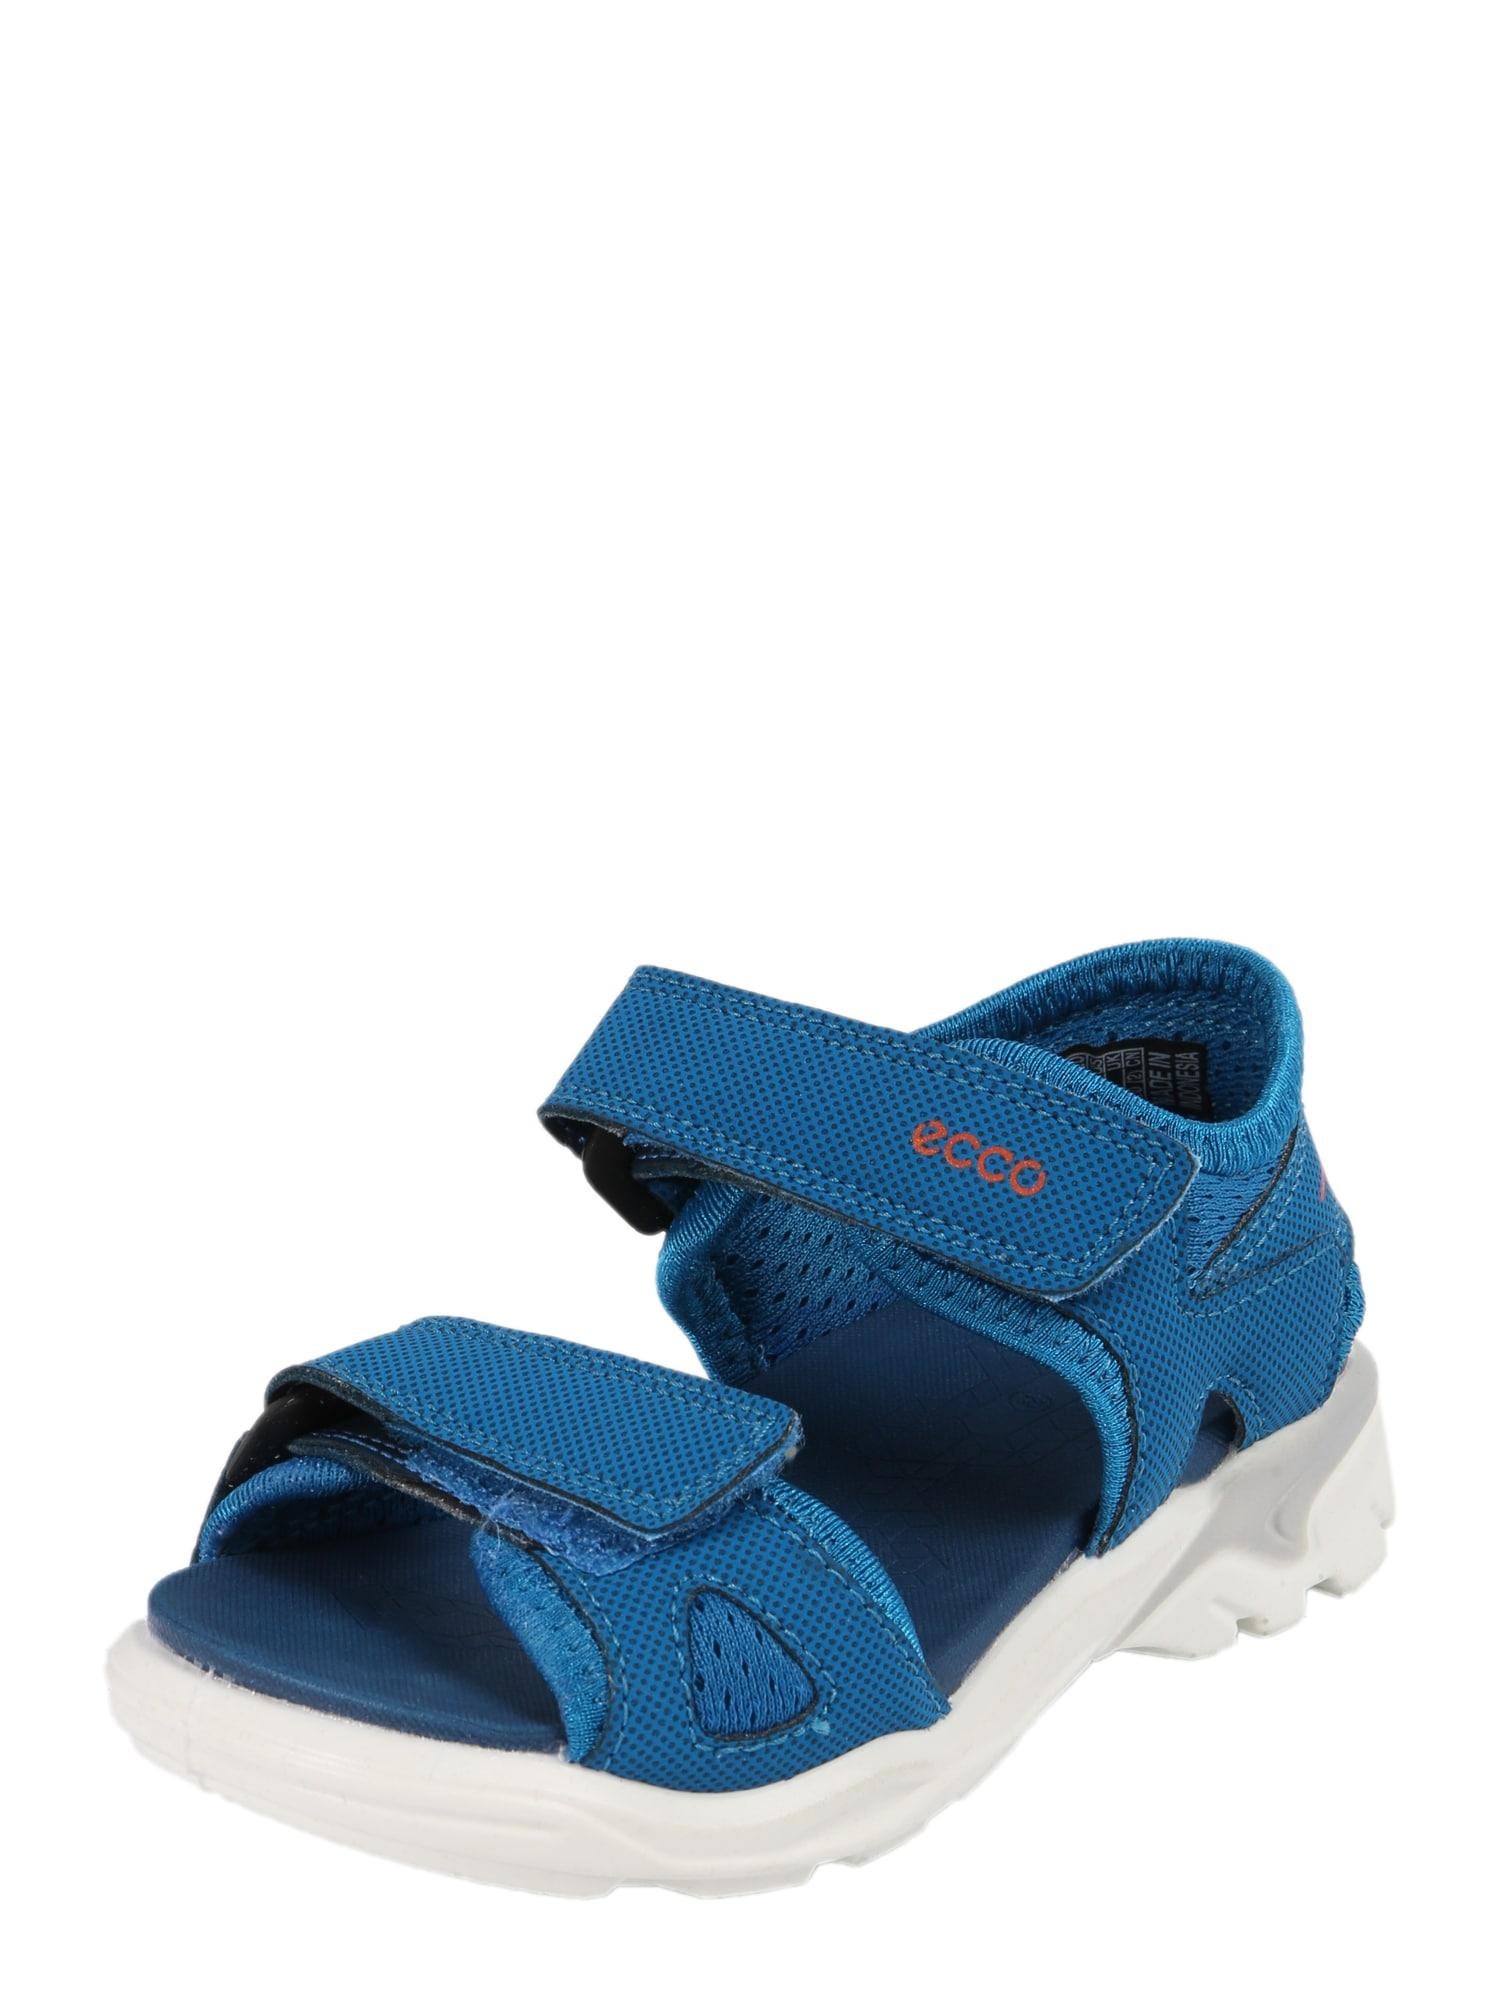 Sandály Biom Raft modrá nebeská modř ECCO